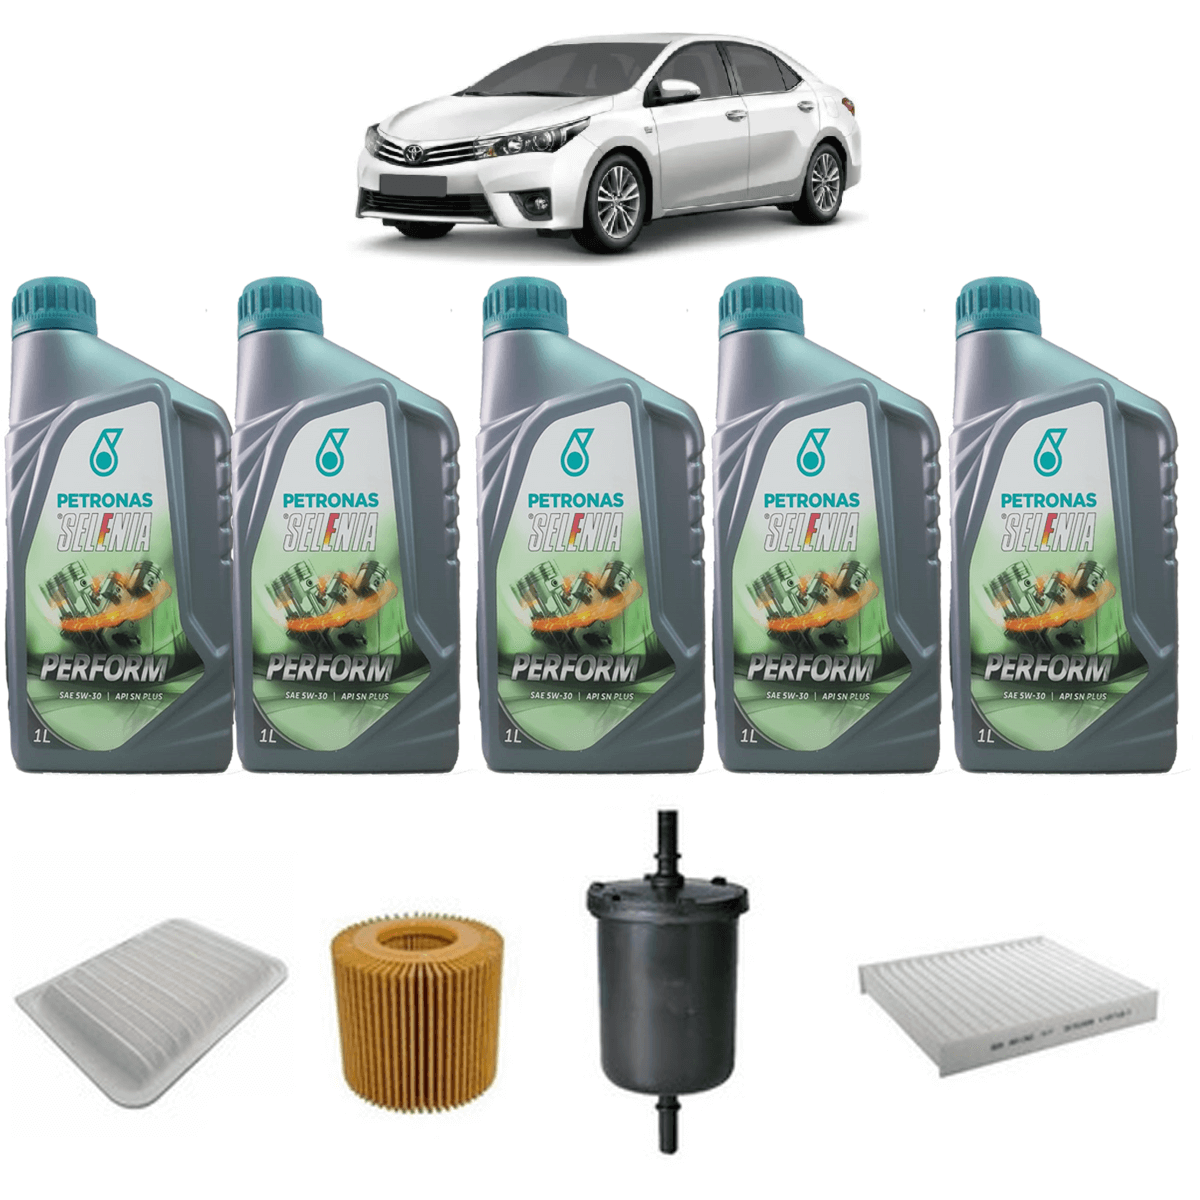 Kit De Filtros E Oleo Corolla 2.0 Xei Xrs Selenia 5w30 em até 6x sem juros